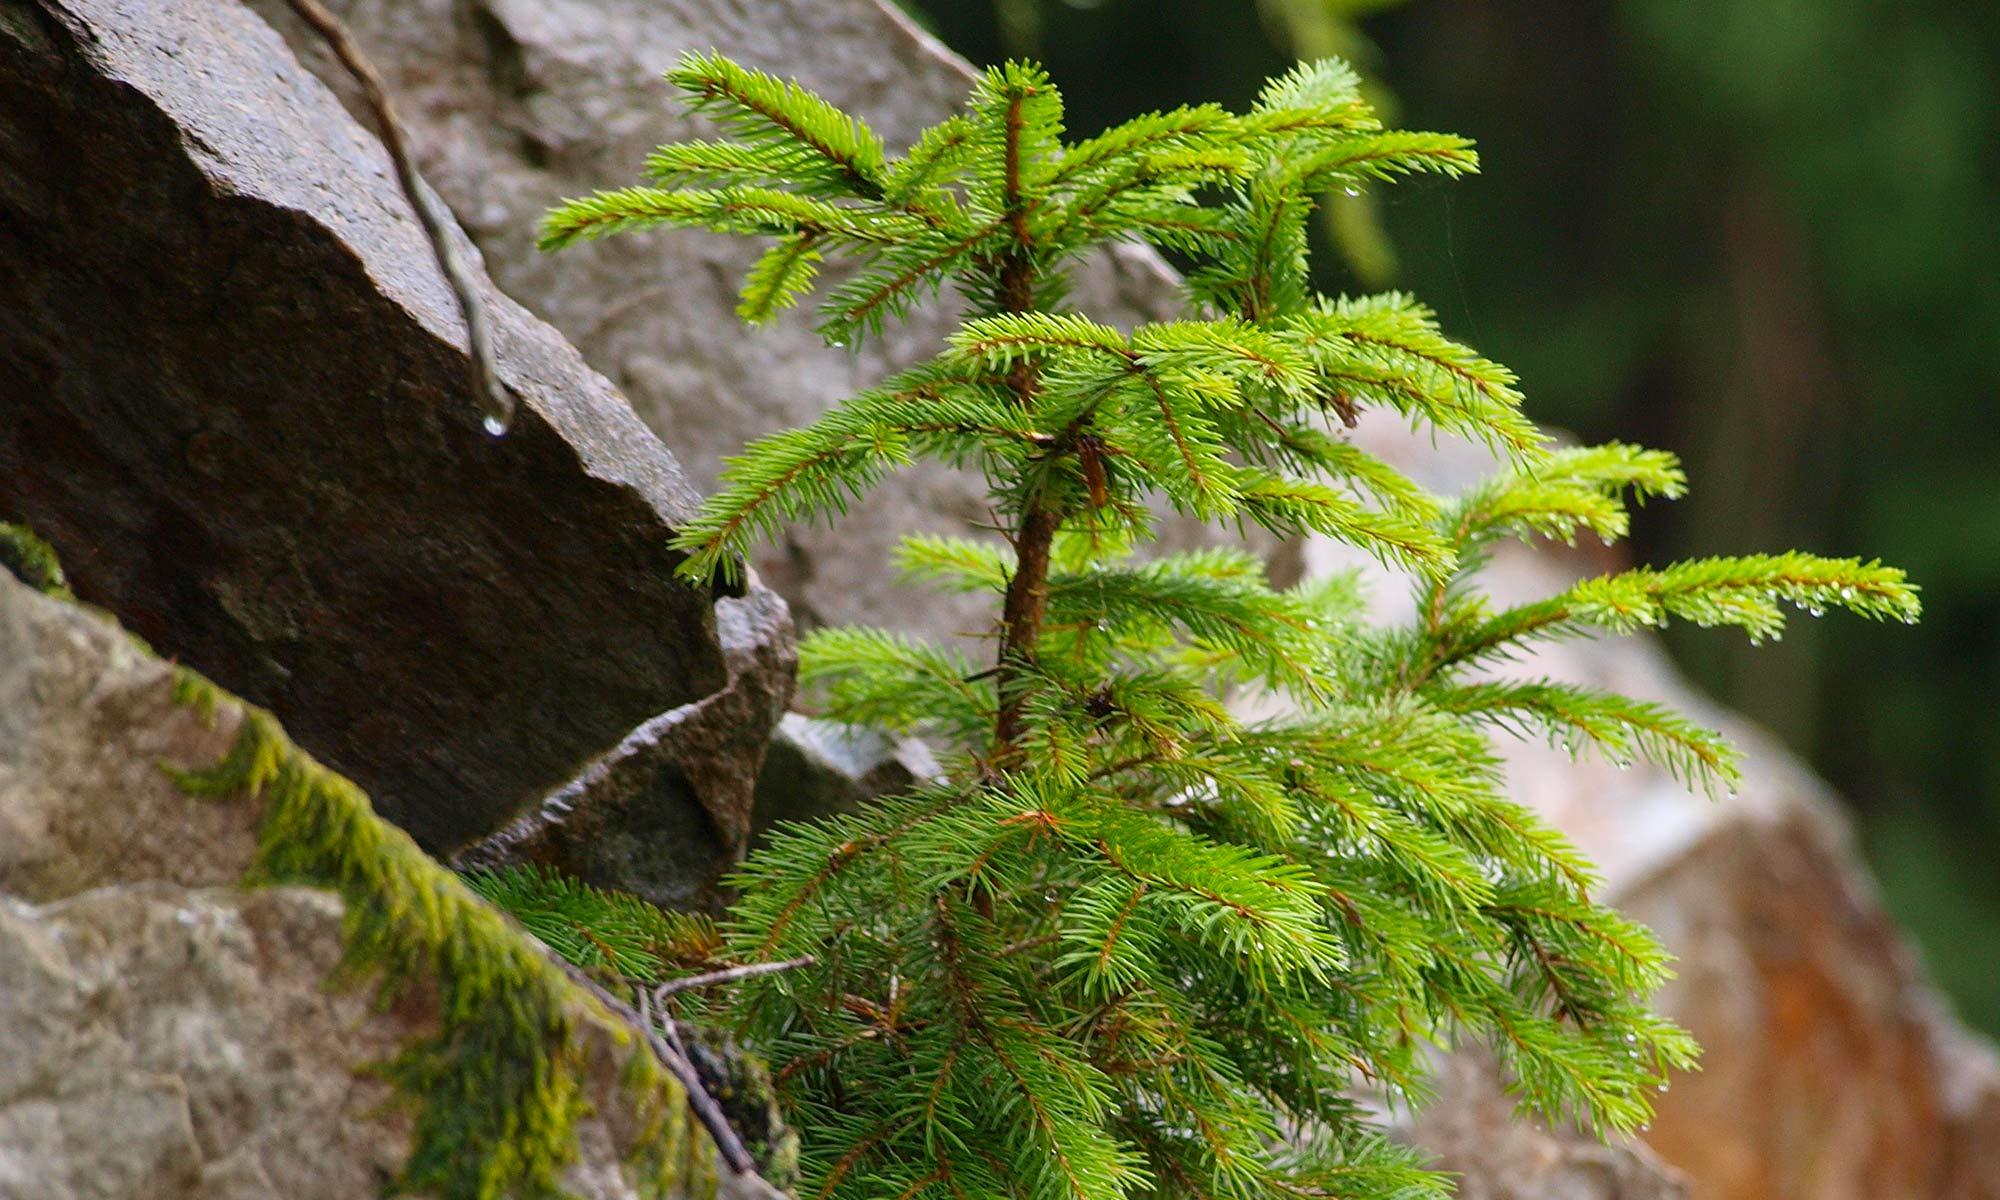 Forstpflanzen der FBG Oberallgäu e.V.